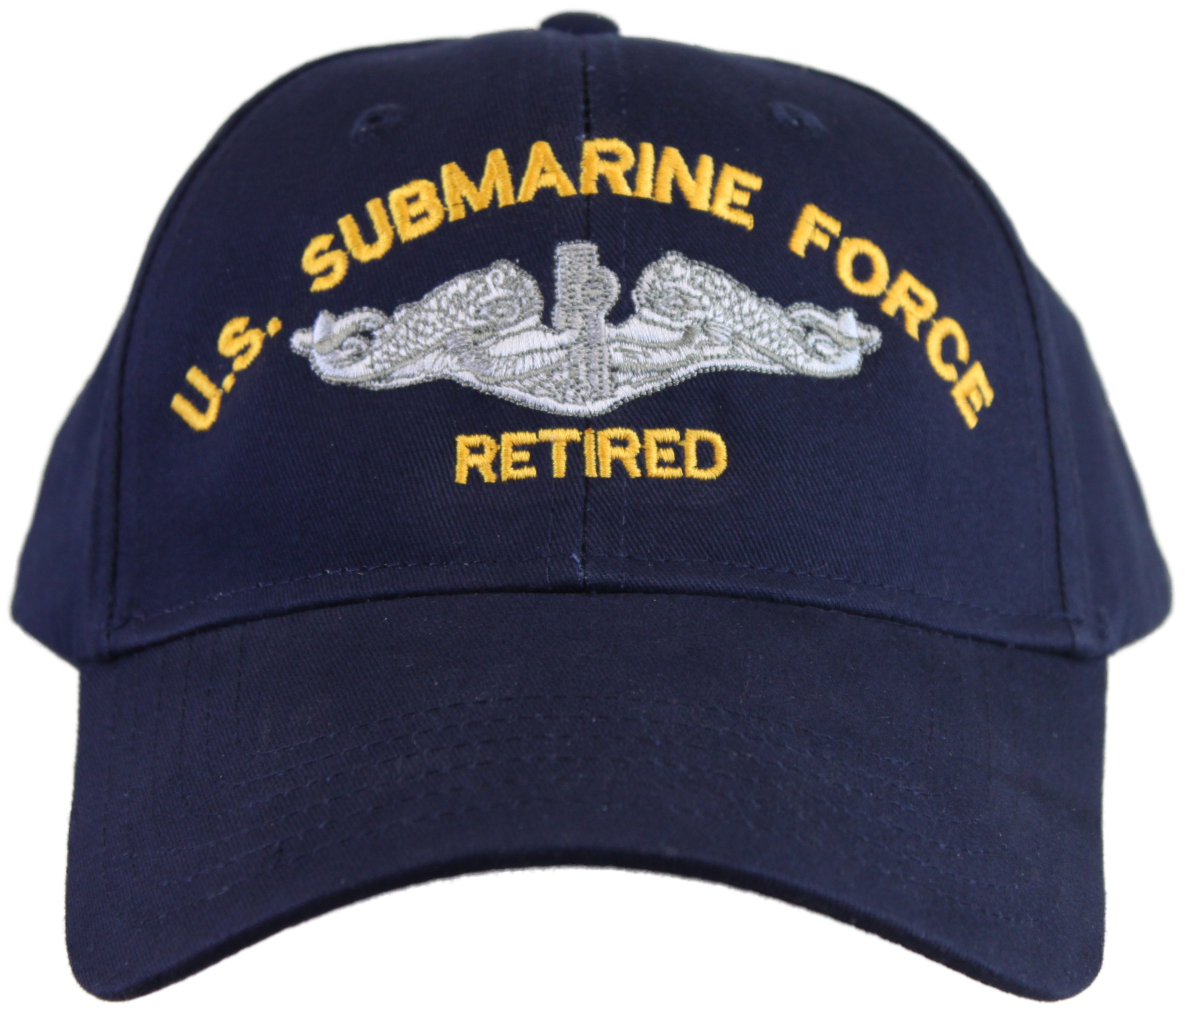 U.S. Submarine Force Retired Ball Cap. Image 1. Loading zoom b5b1c49938d